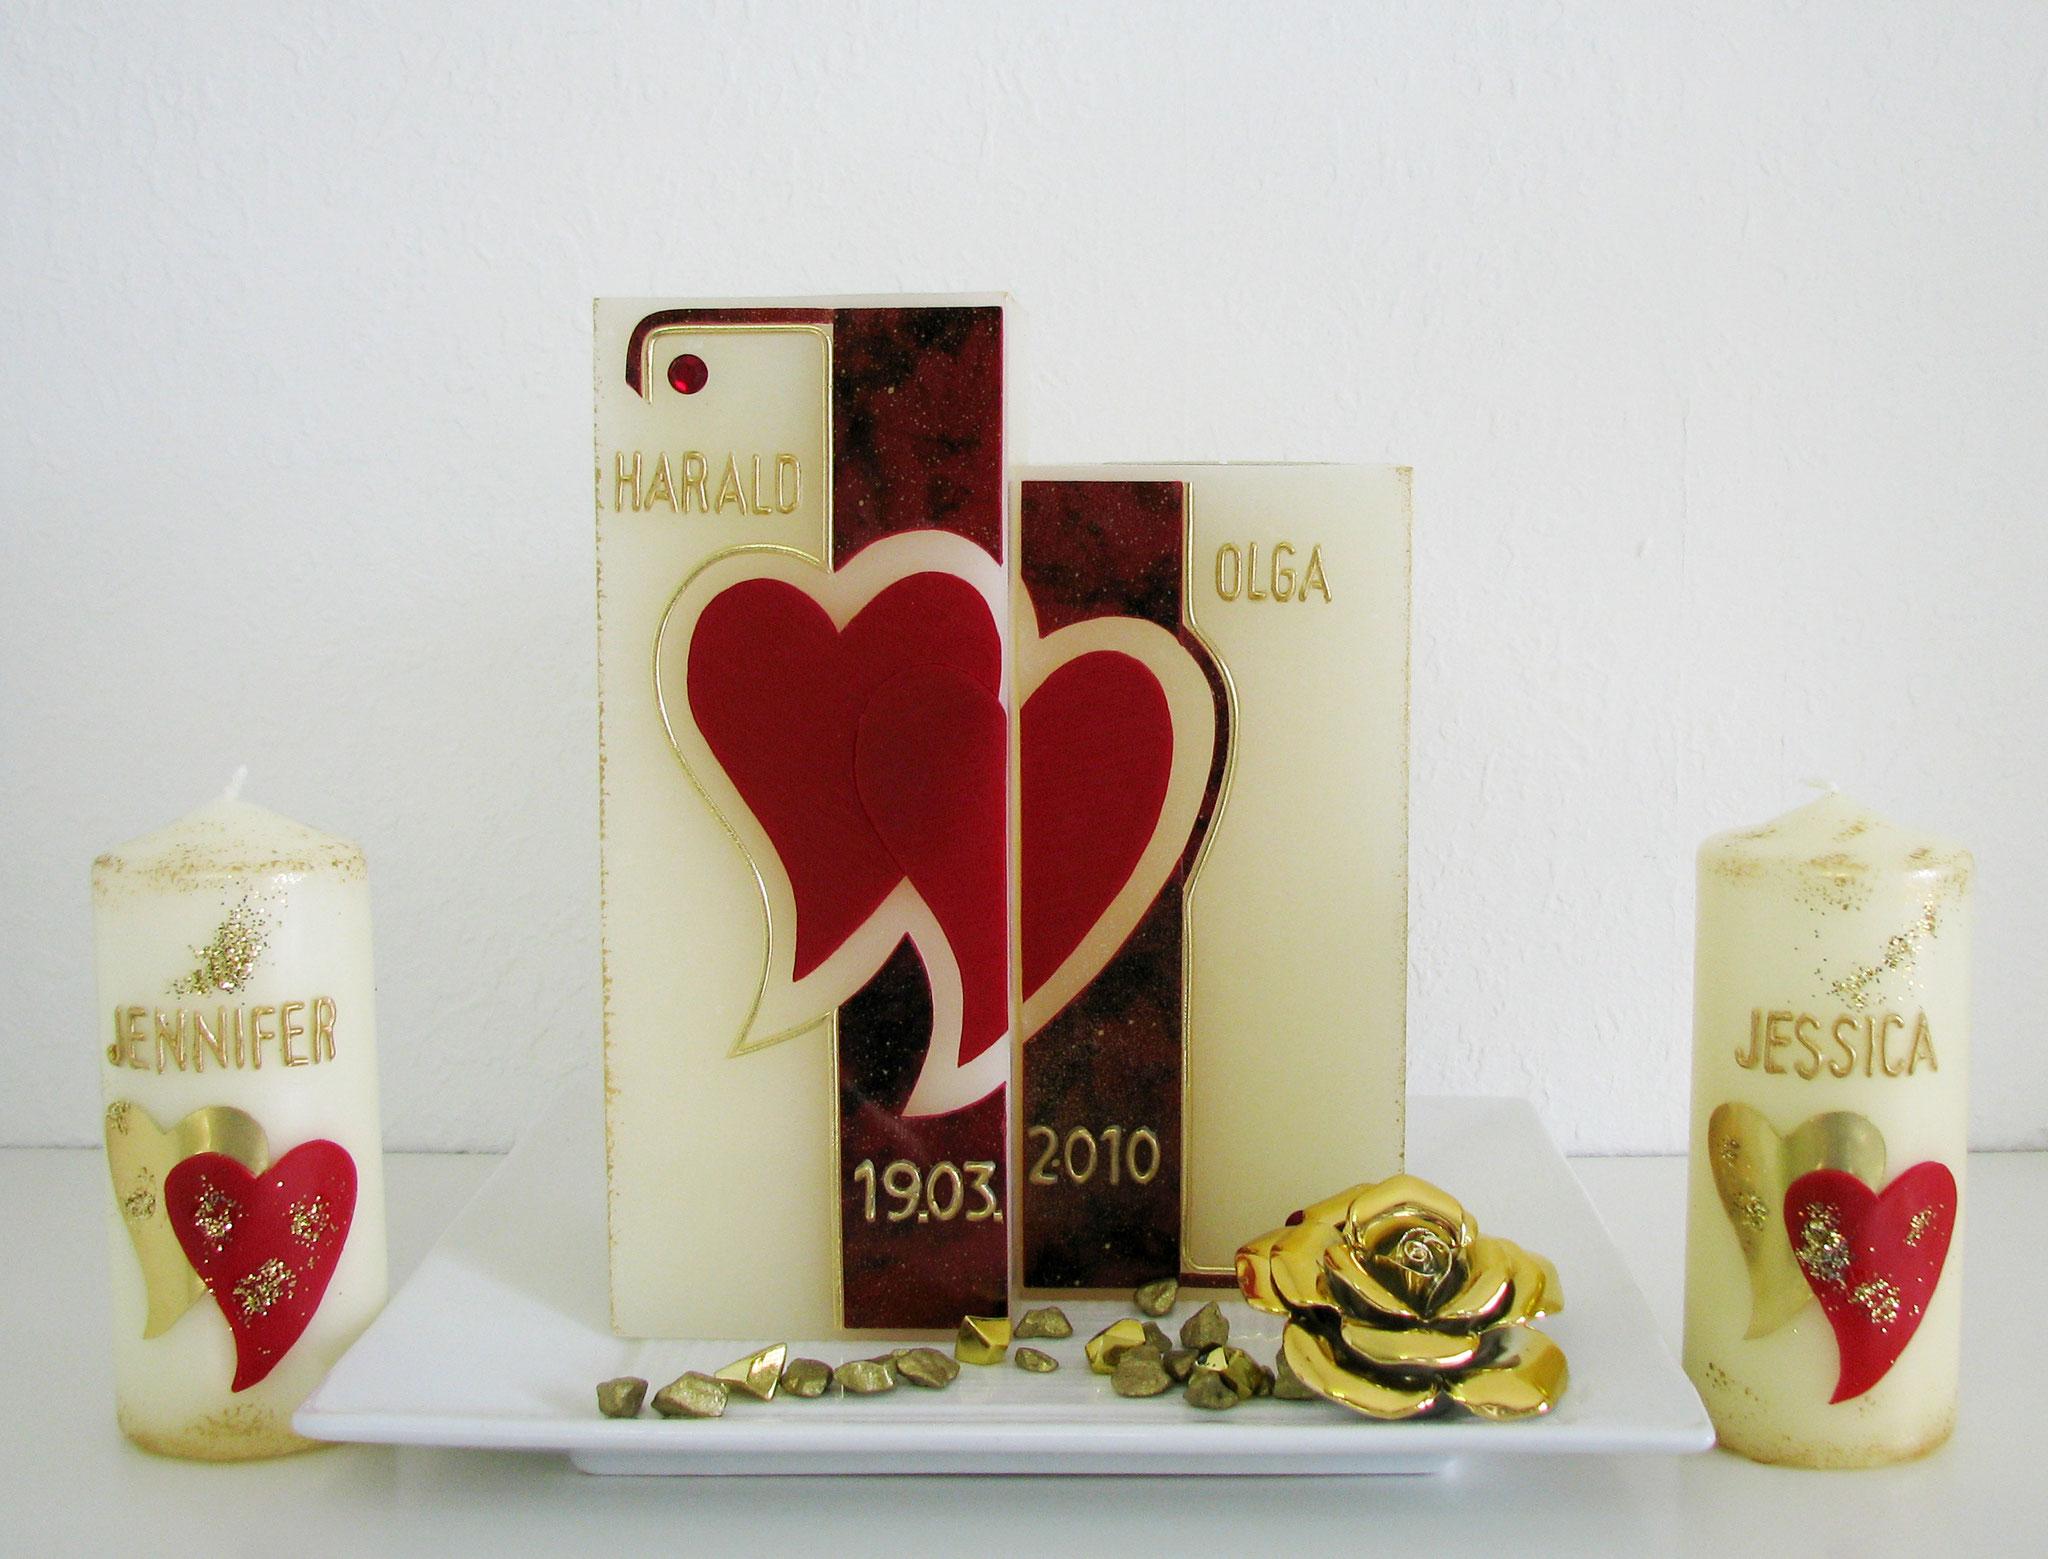 HE-0046Z, zweiteillig, HxB ca. 20 cm x 15 cm, Preis ca. € 50,-- (Kleinere Kerzen je €7,--)